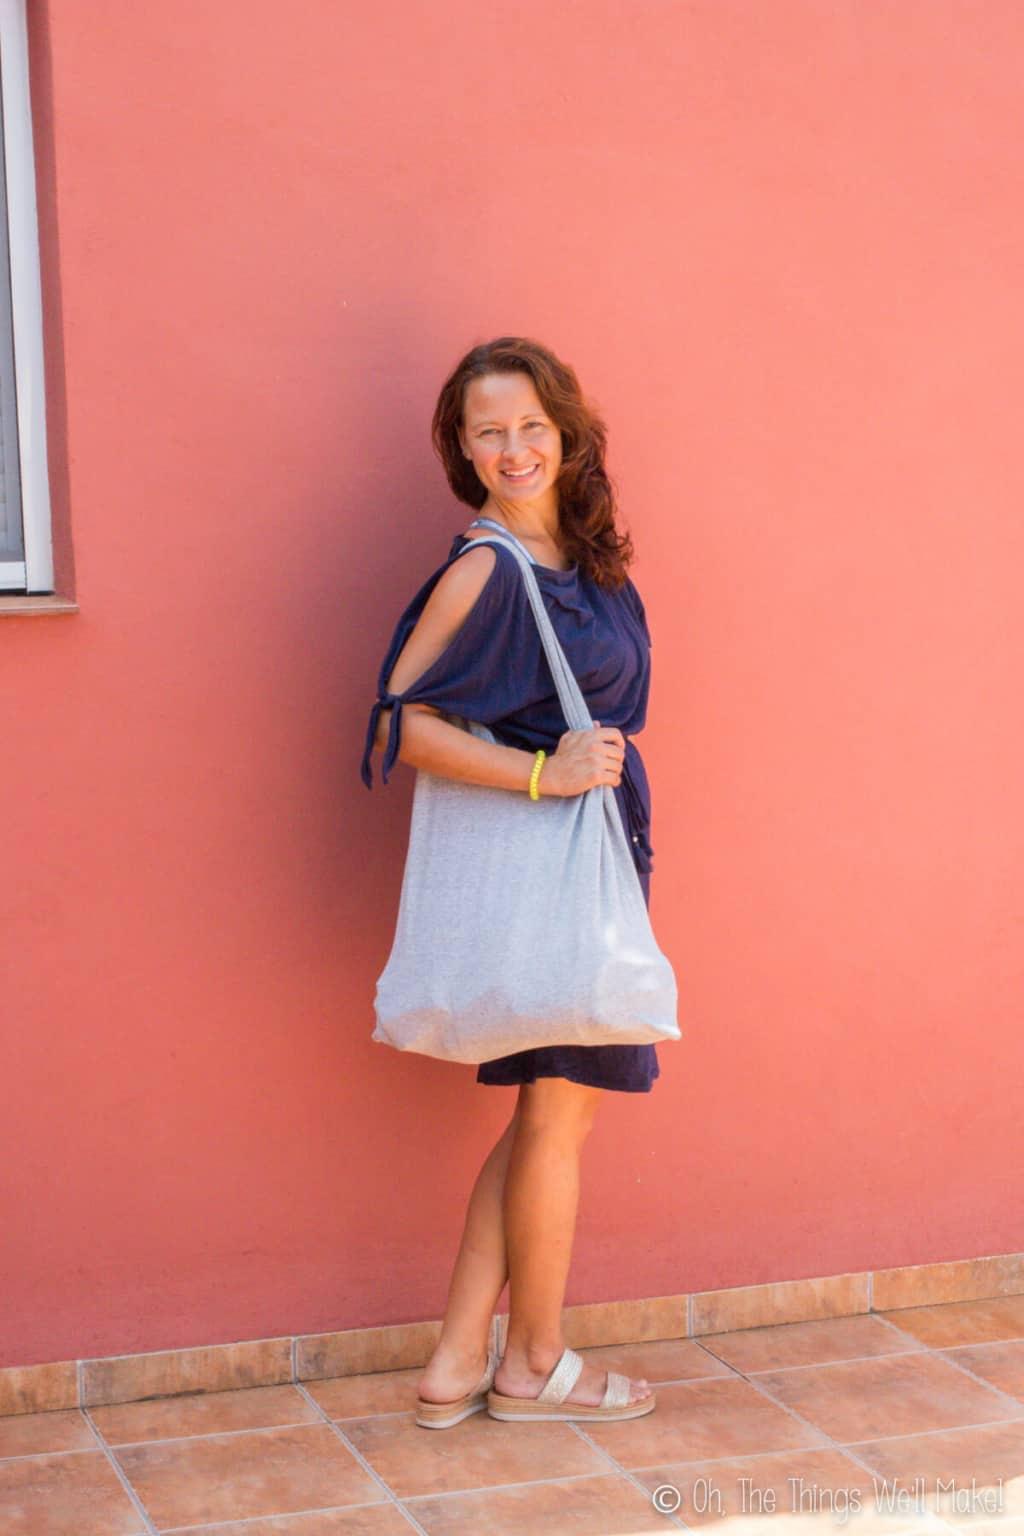 A caucasian woman smiling wearing a navy blue dress showing off her handmade striped t-shirt bag.